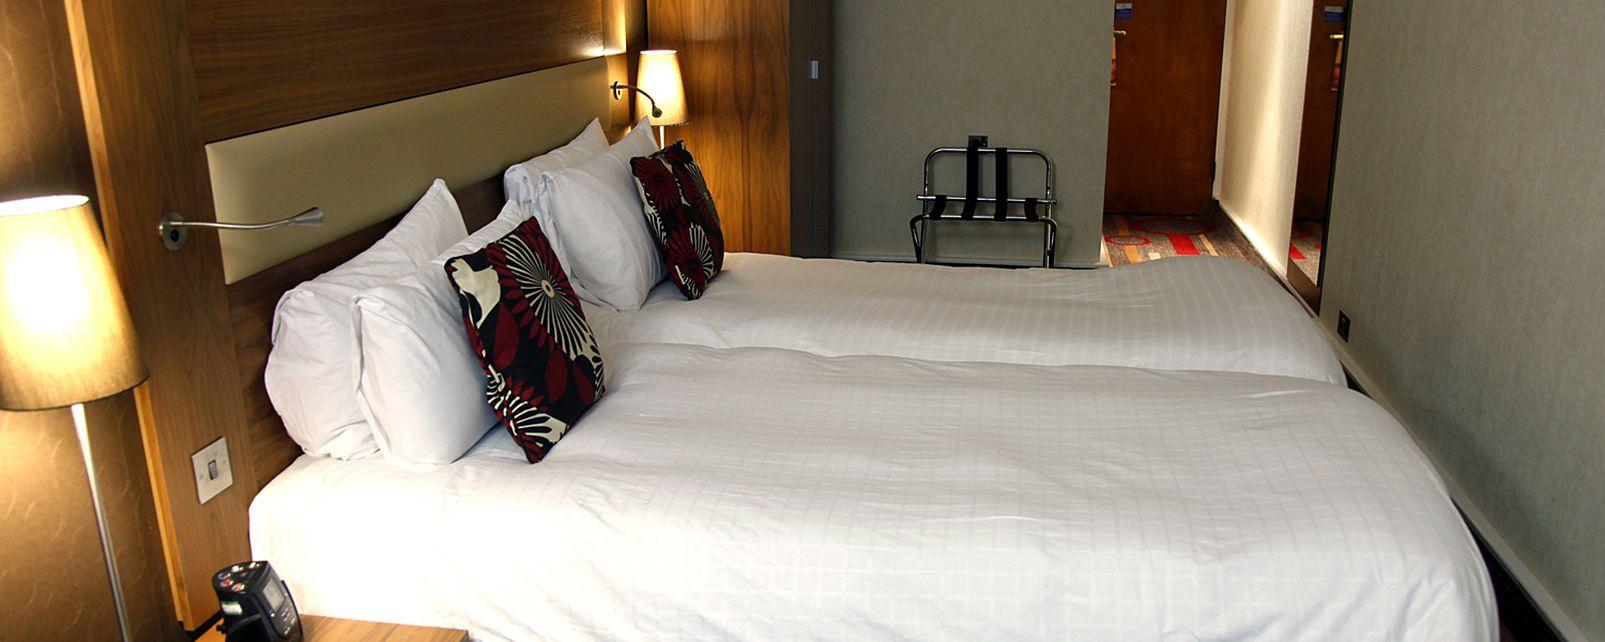 Hôtel Hilton Olympia